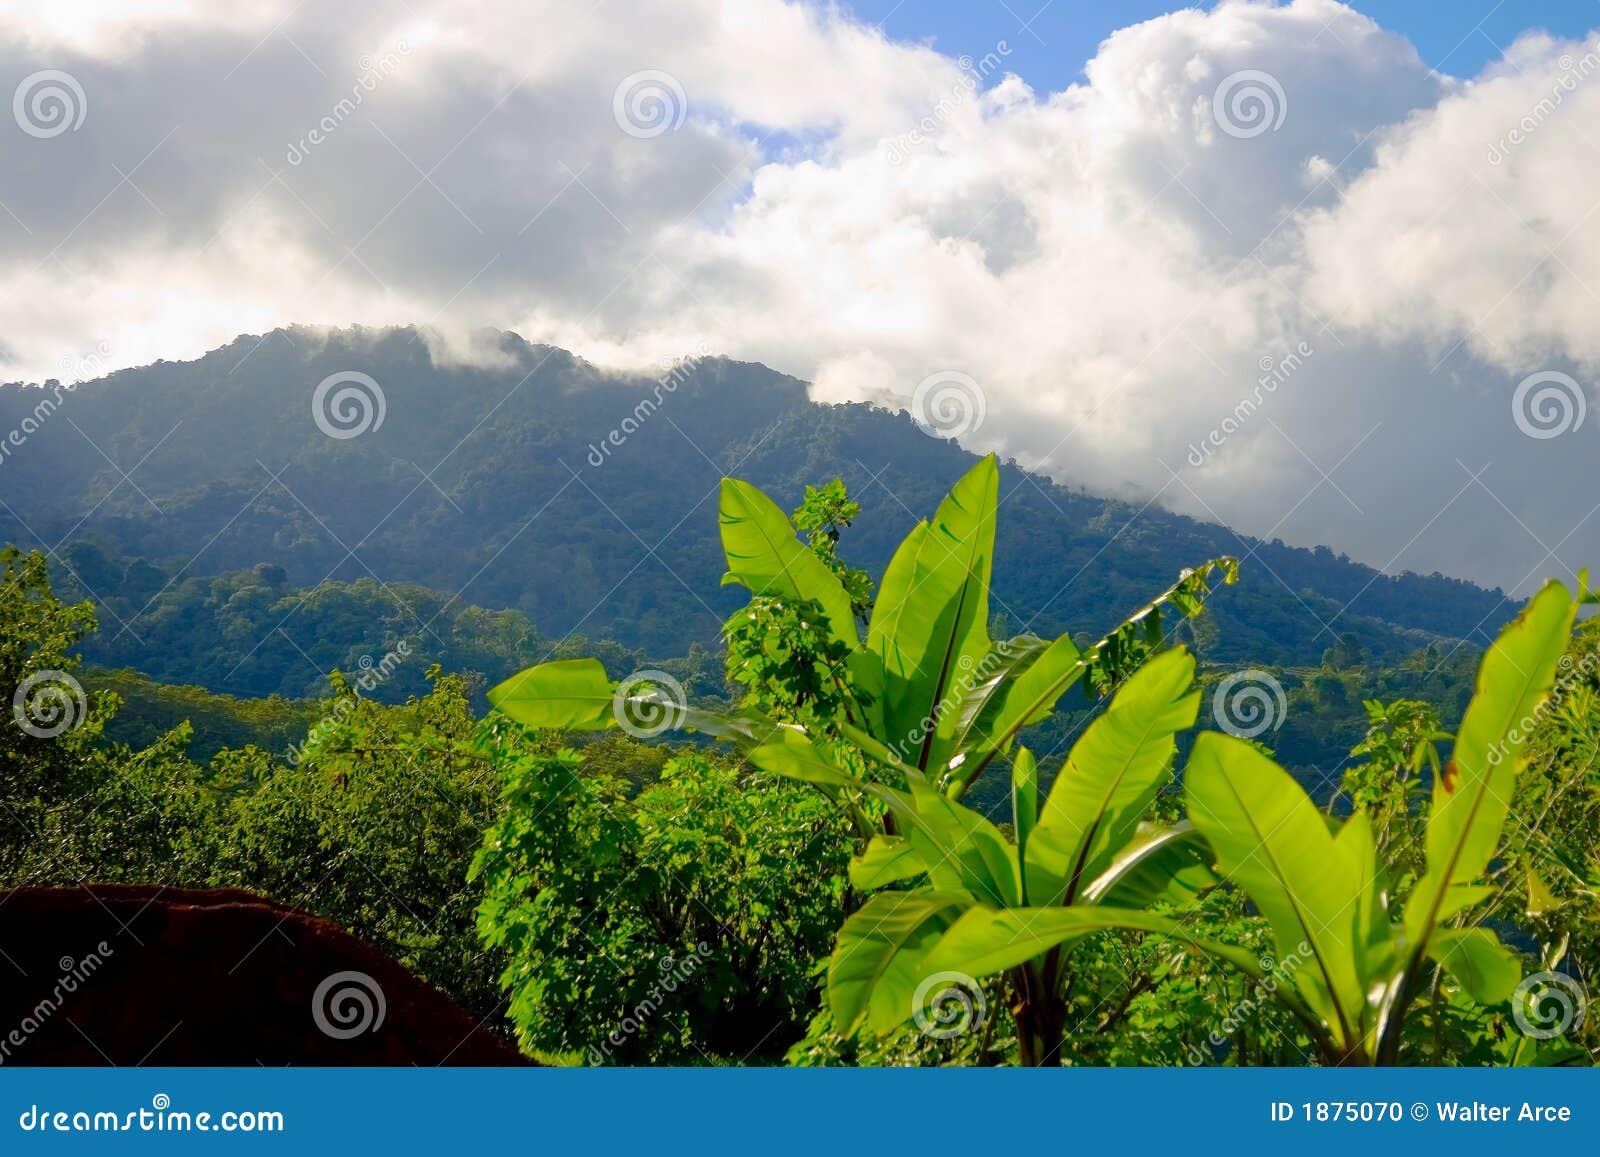 Jaguar San Jose >> Mountains In San Jose, Costa Rica Stock Photo - Image: 1875070